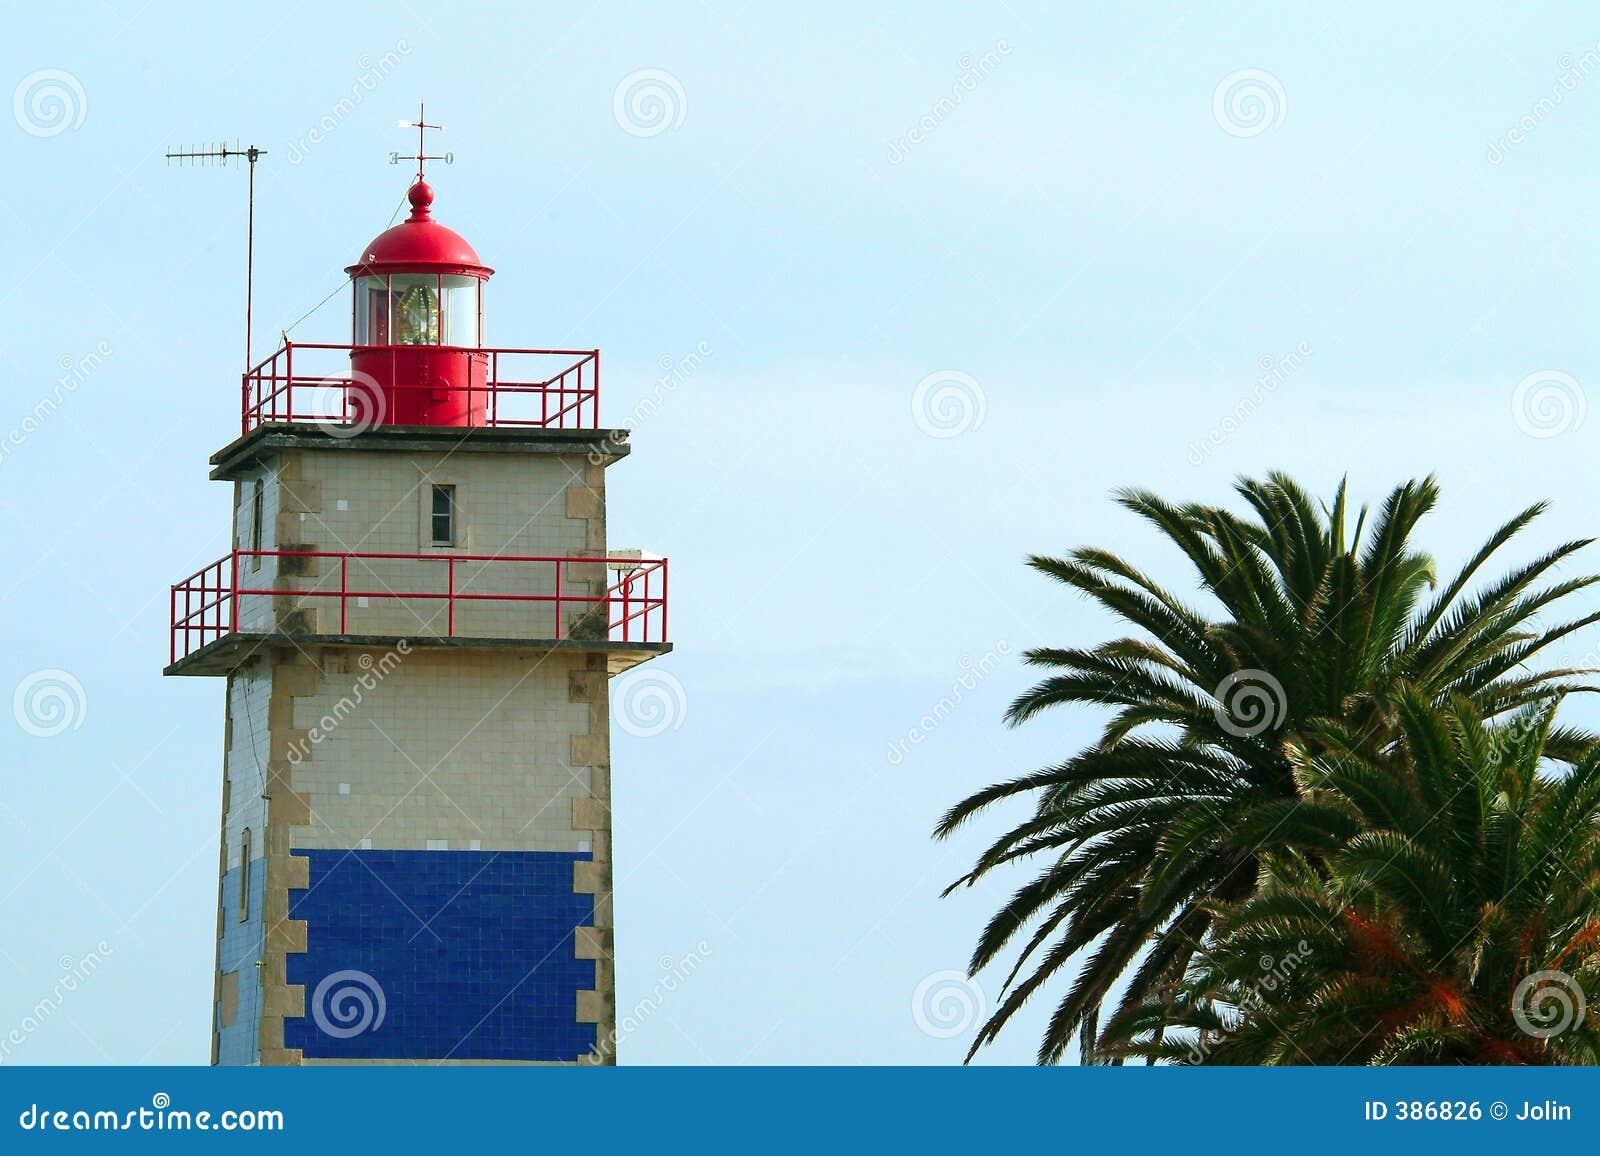 Lighthouse palm